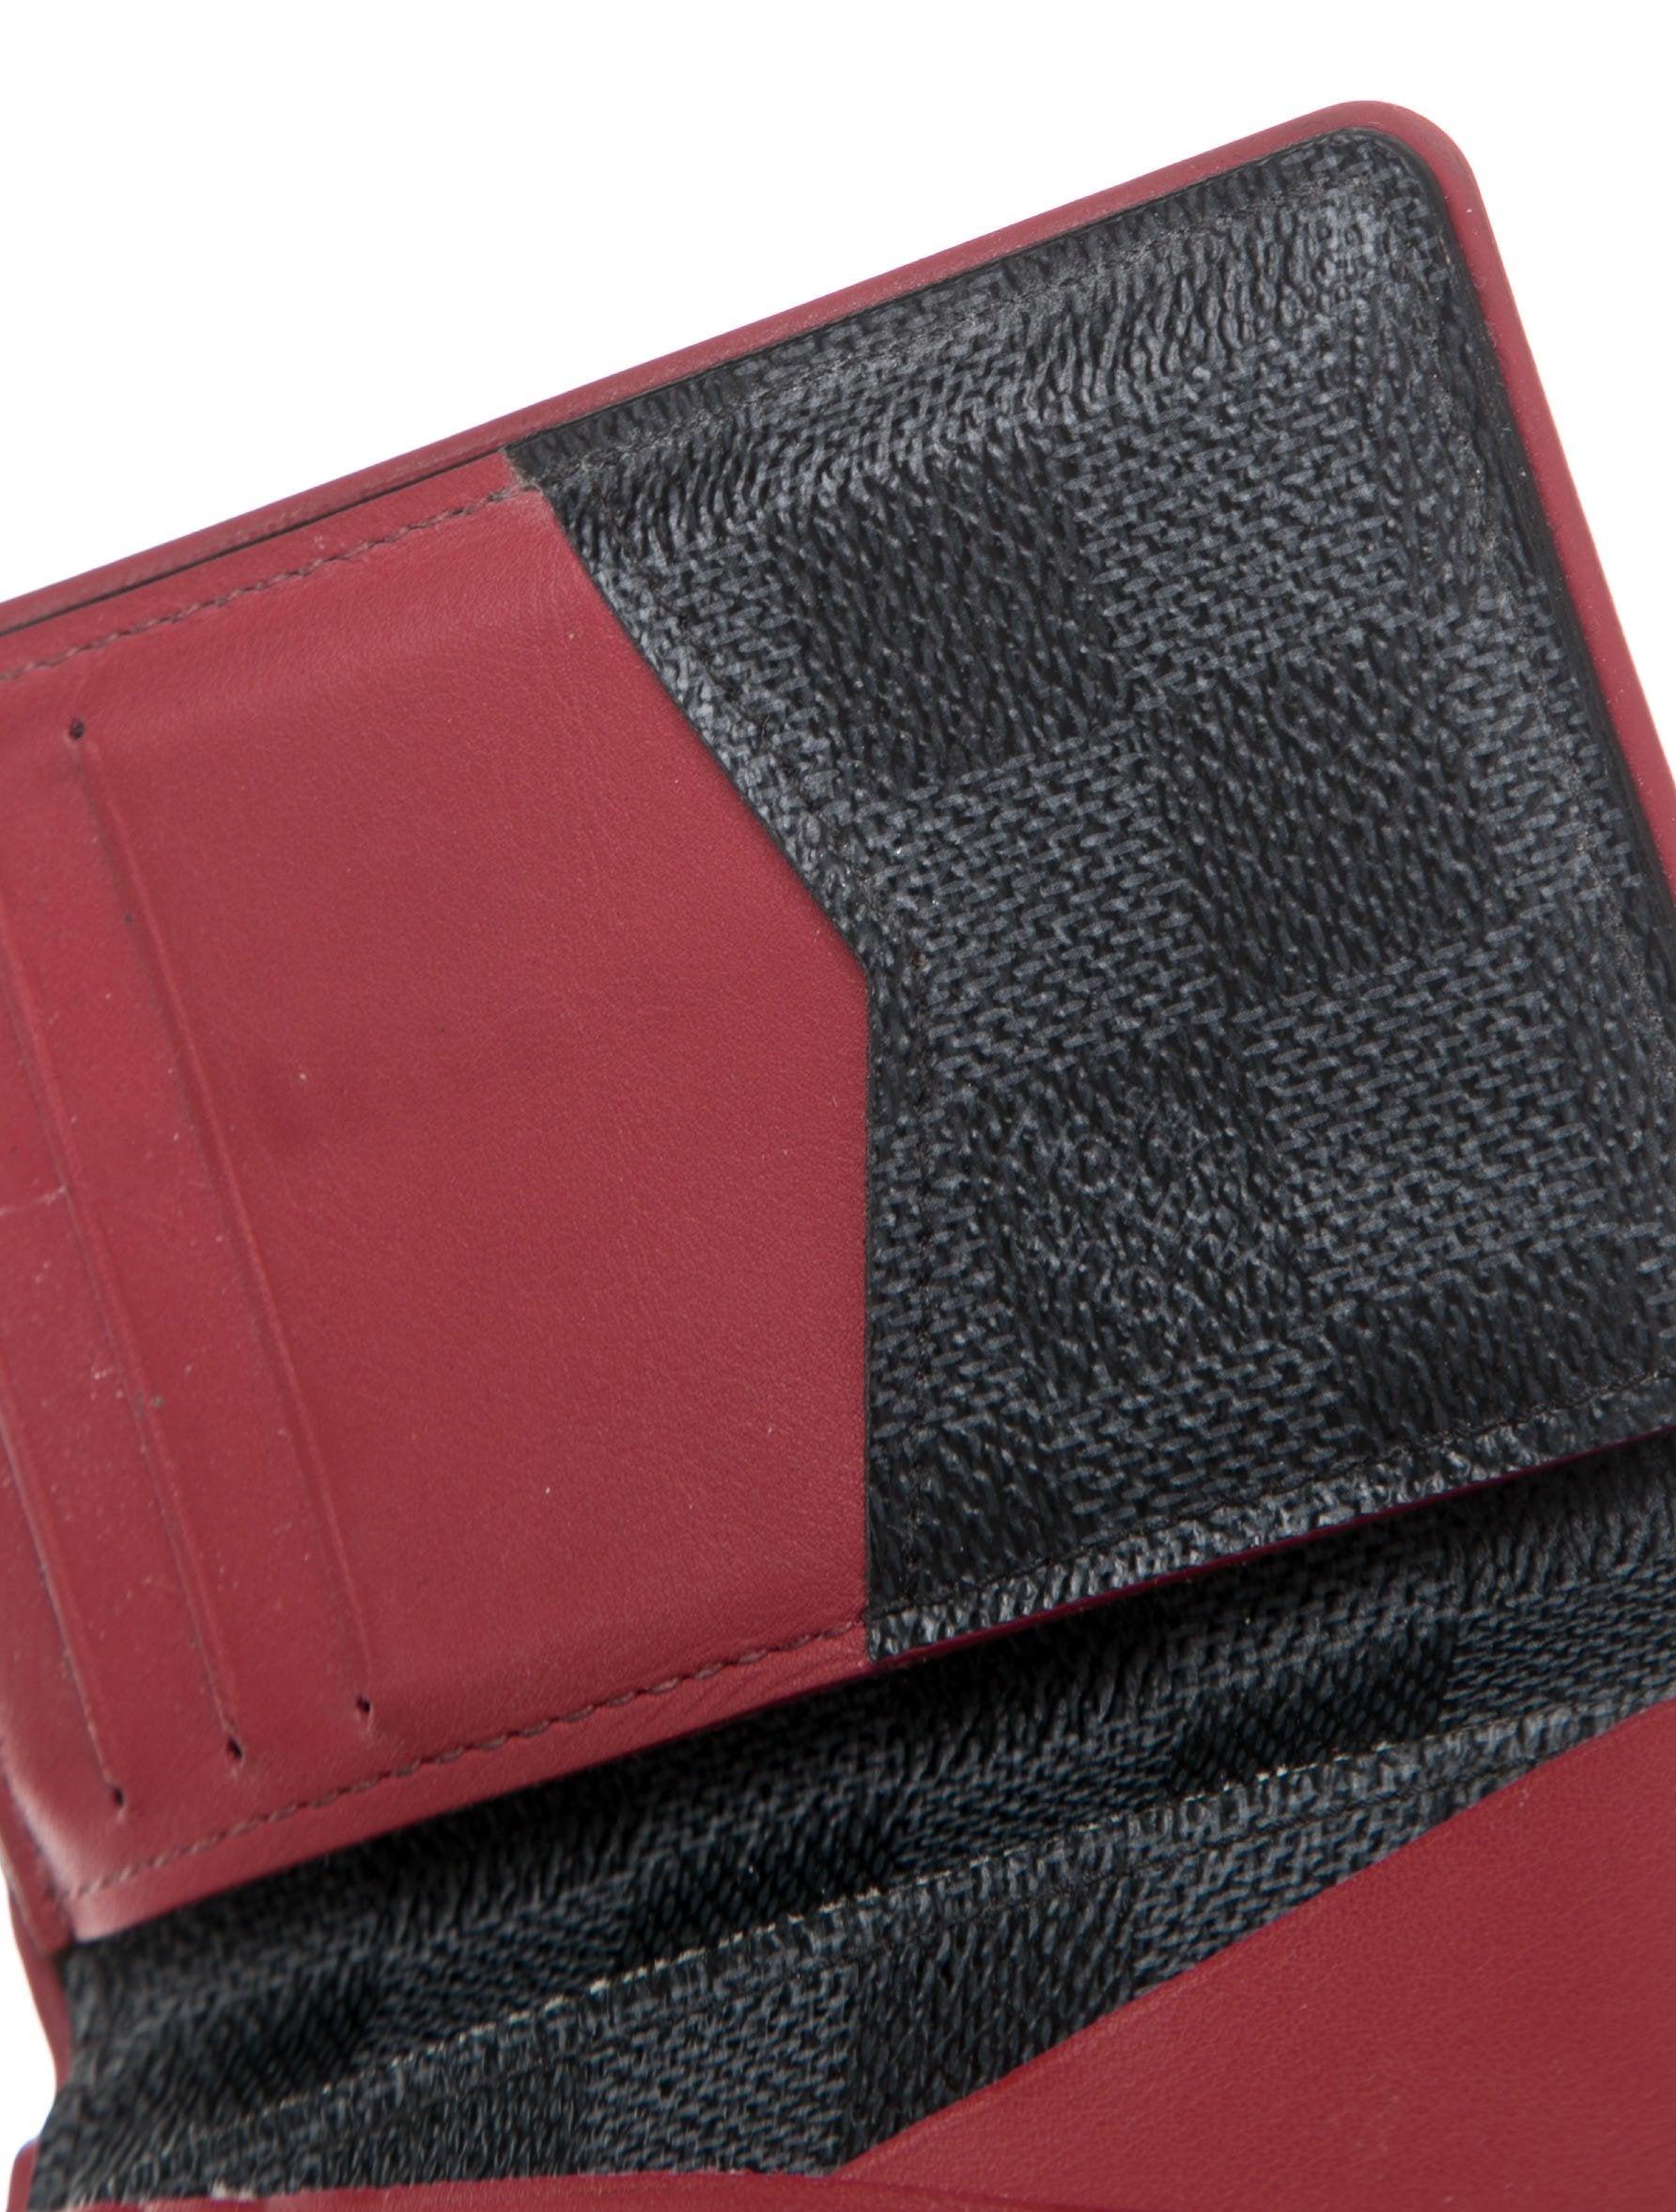 55e581e5bbd Louis Vuitton Damier Pocket Organizer - Accessories - LOU114219